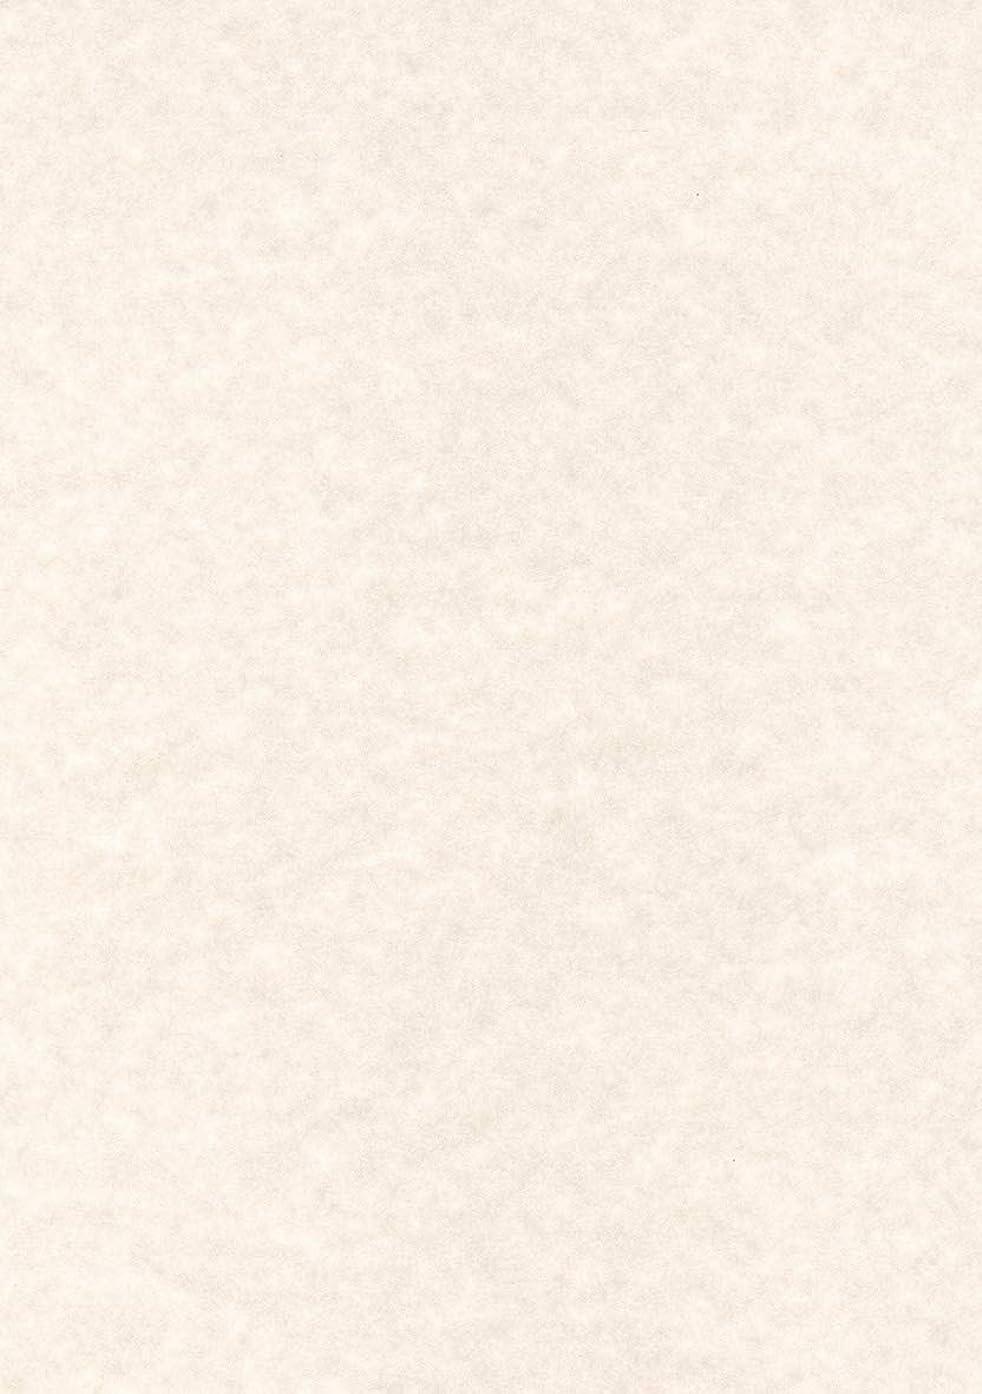 Agipa PCL1678?Textured Vellum Paper?–?A4?–?260?g/m2, Warm Grey